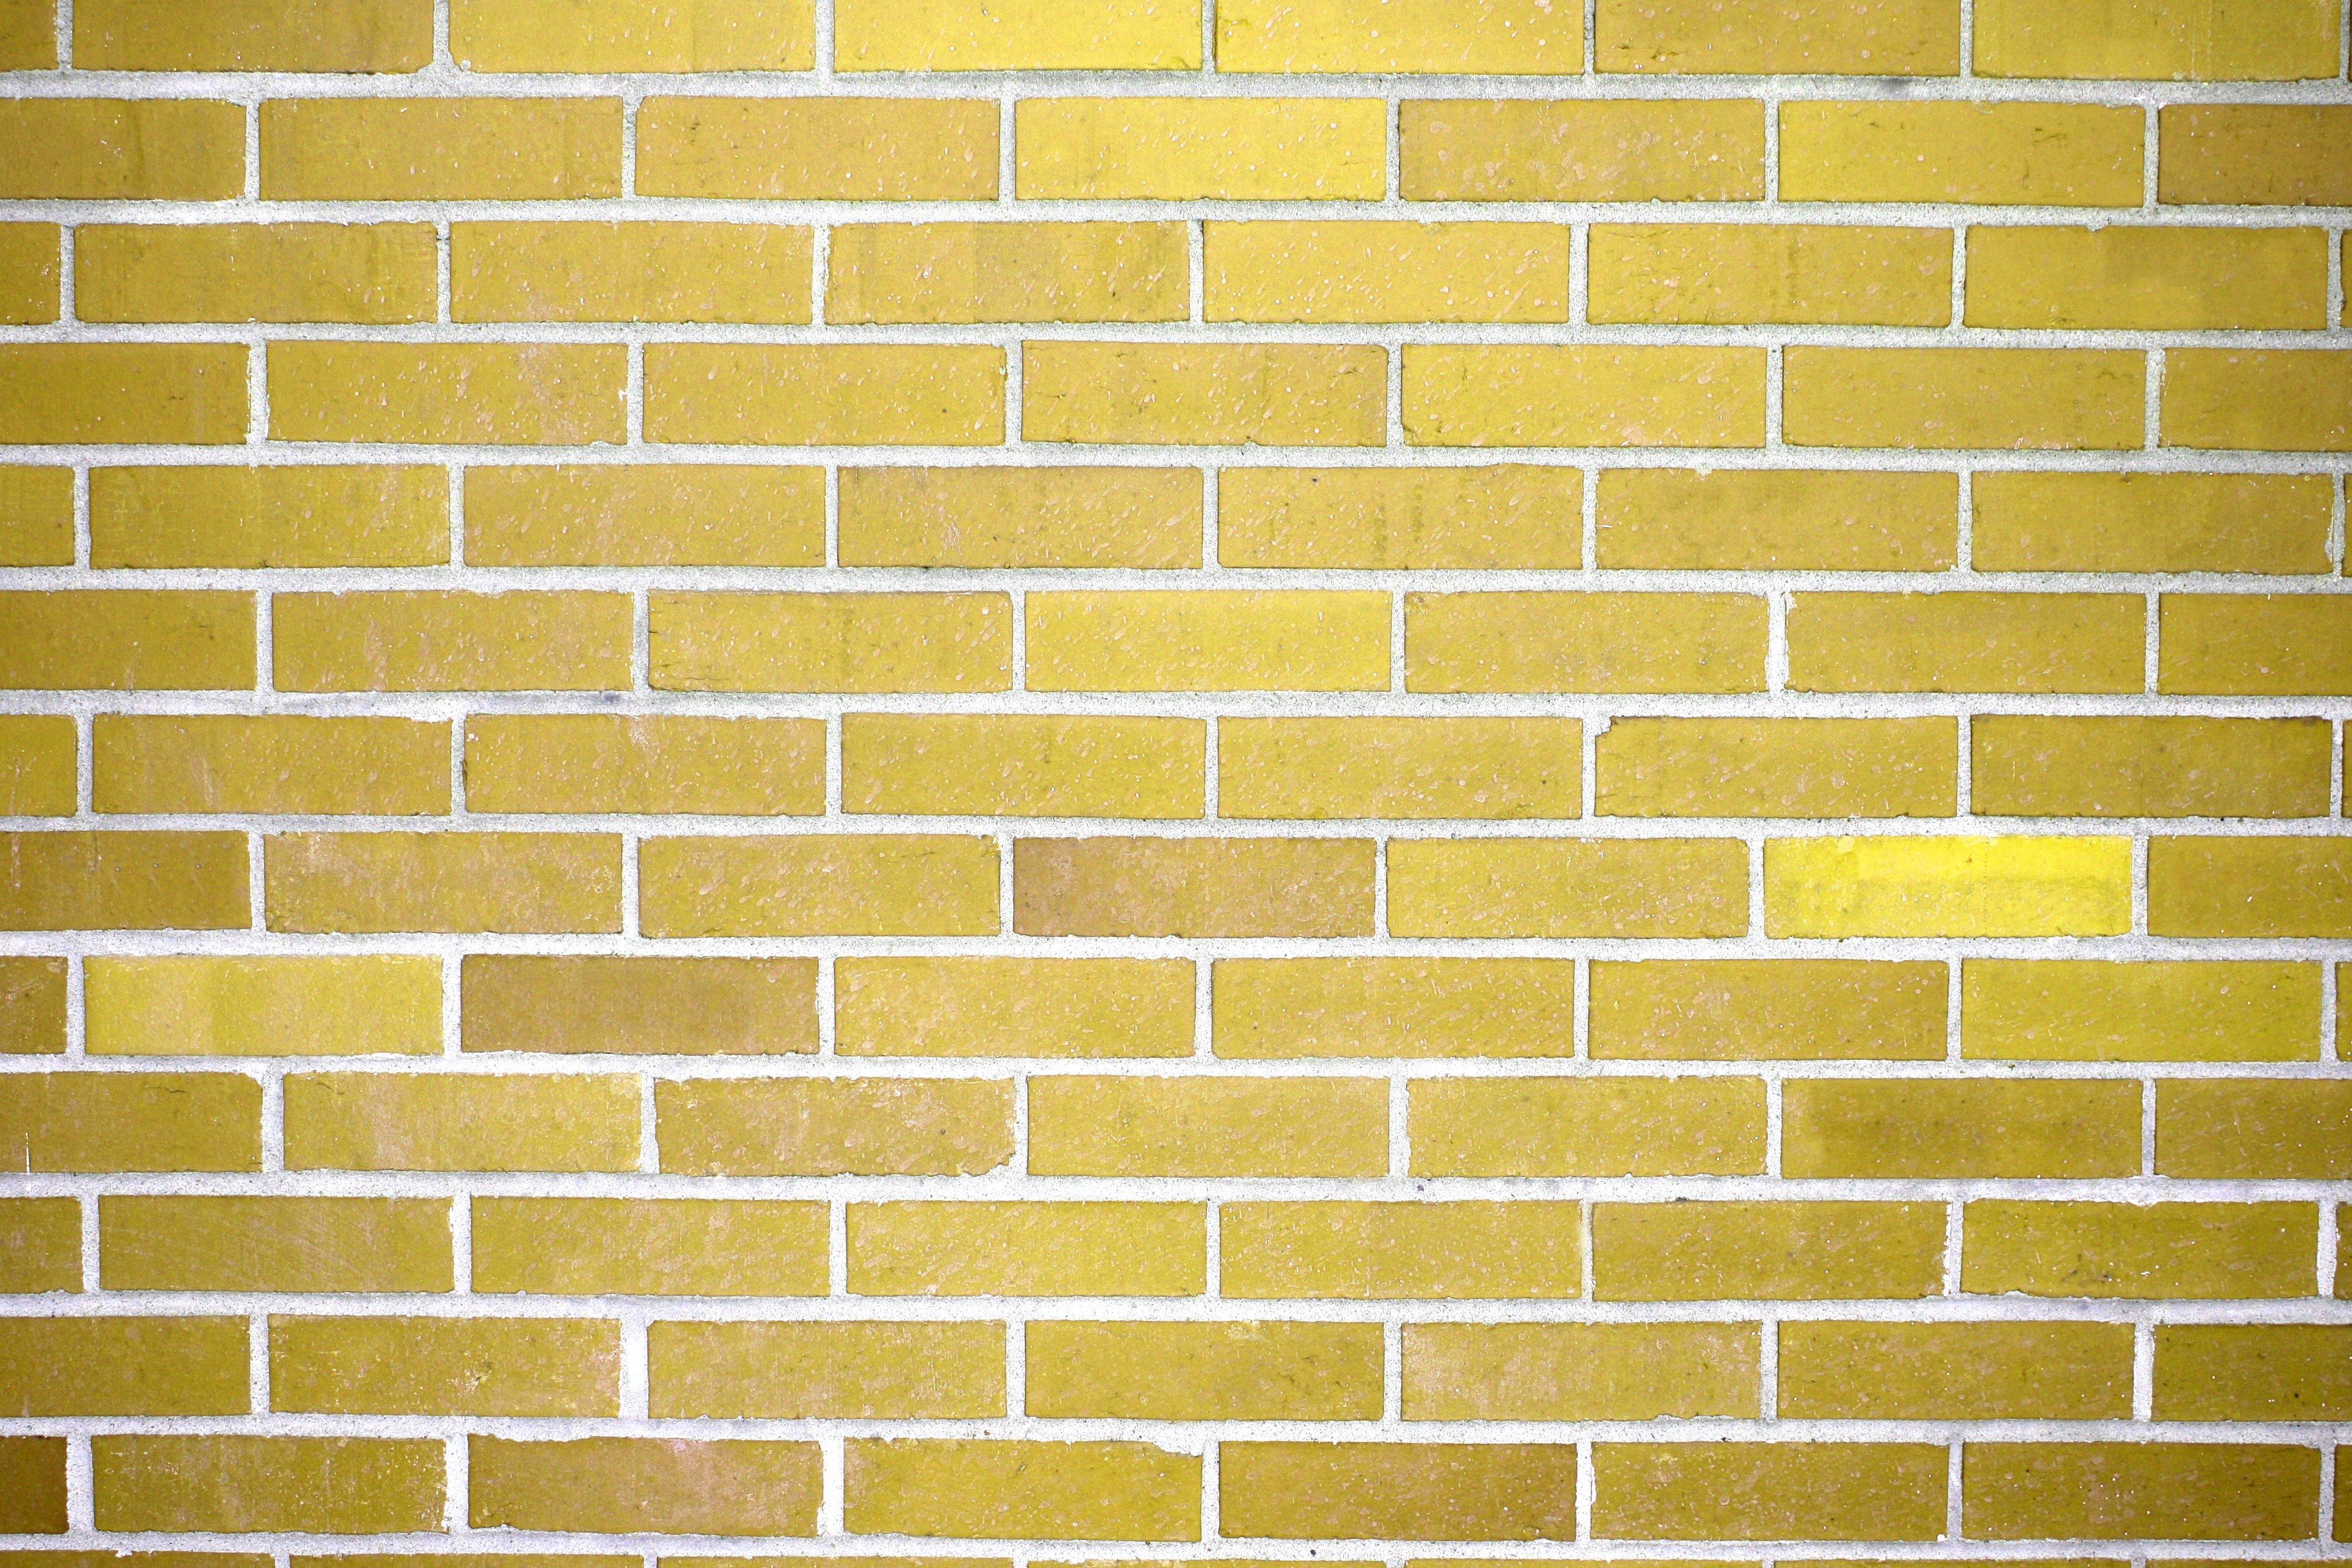 Brick Walls Pictures | Free Photographs | Photos Public Domain